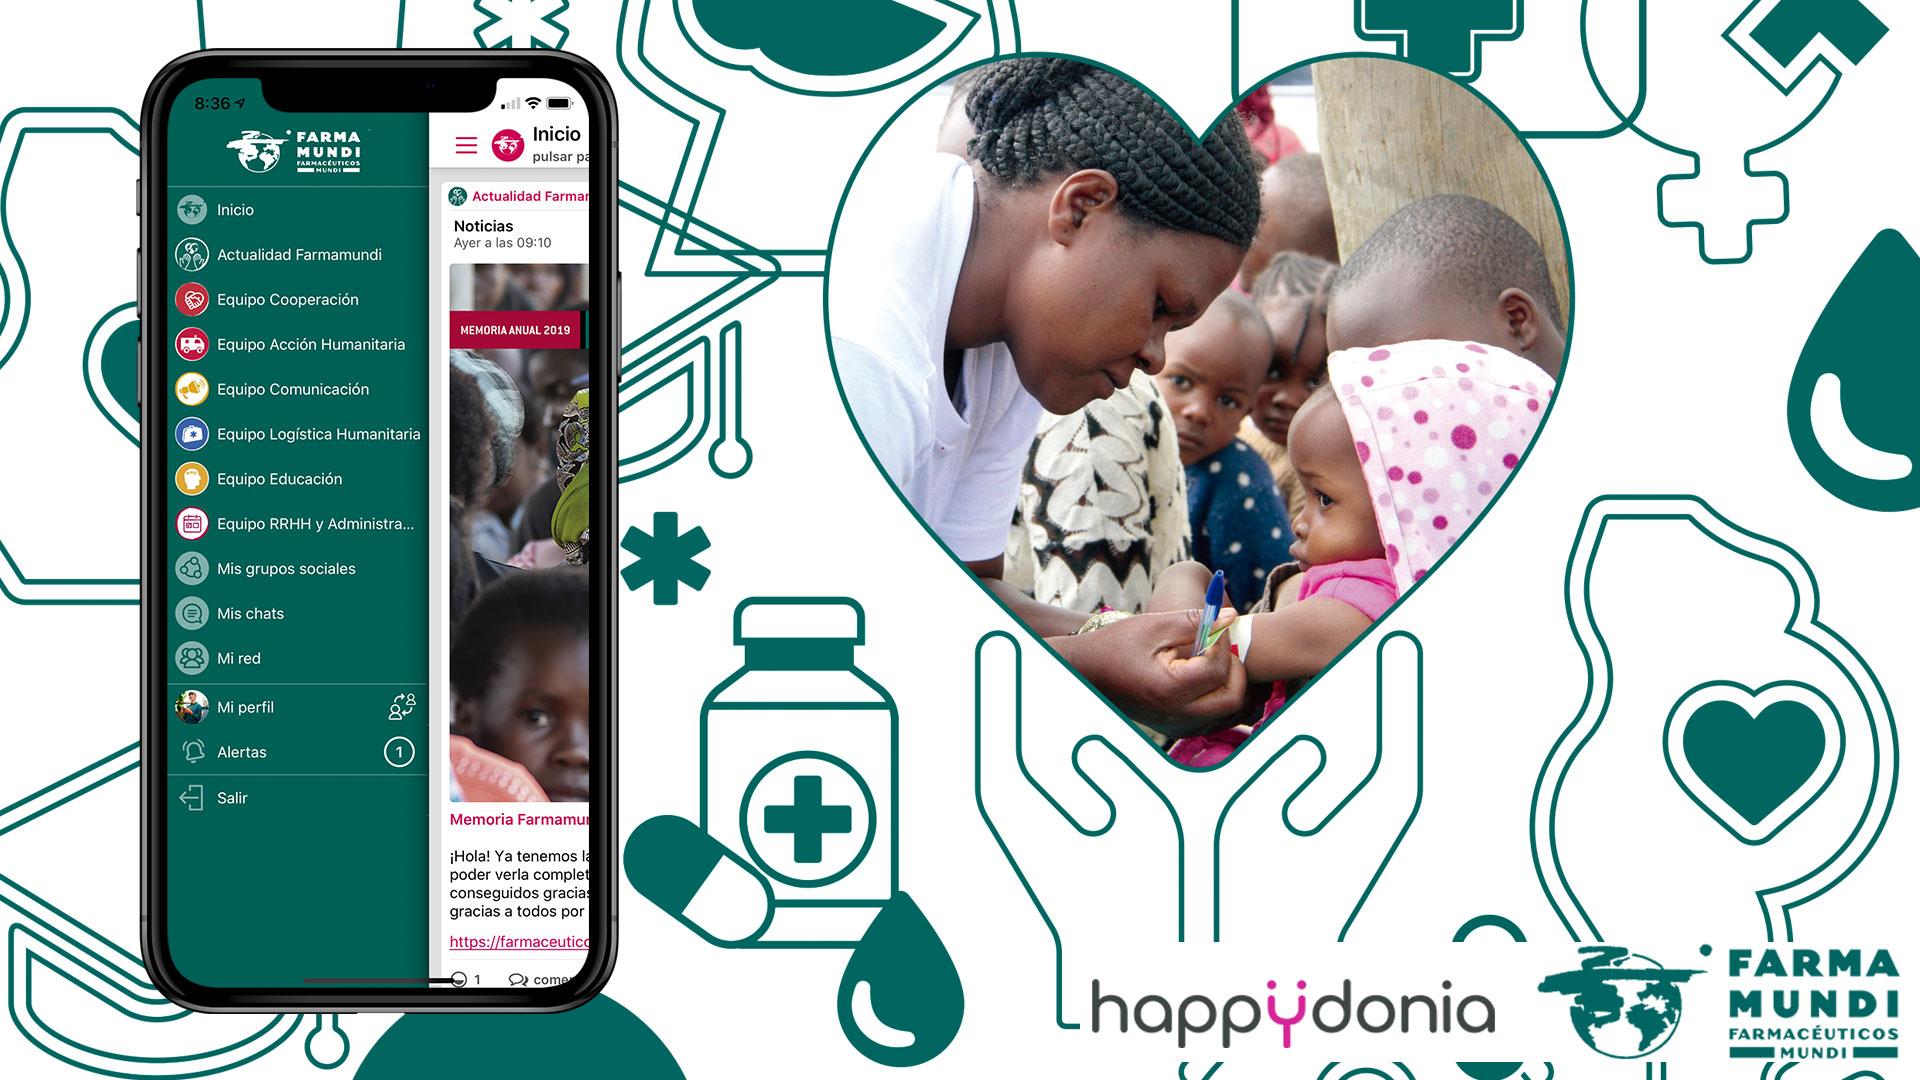 Nos unimos a Farmamundi, la ONG conectará a todo su equipo a través de Happÿdonia